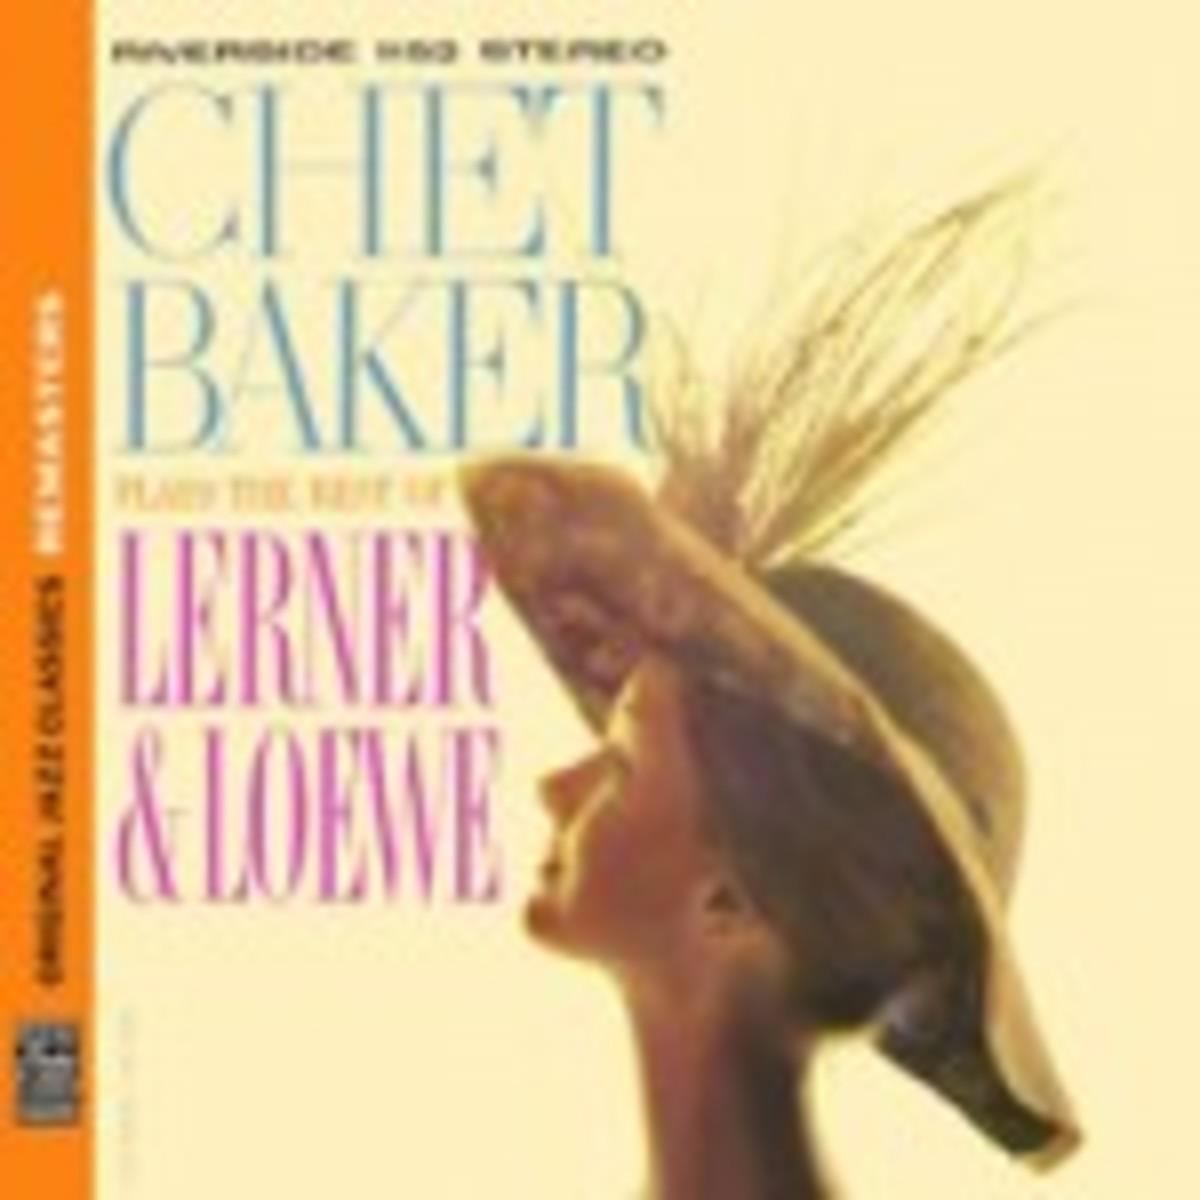 Chet Baker Lerner and Loewe